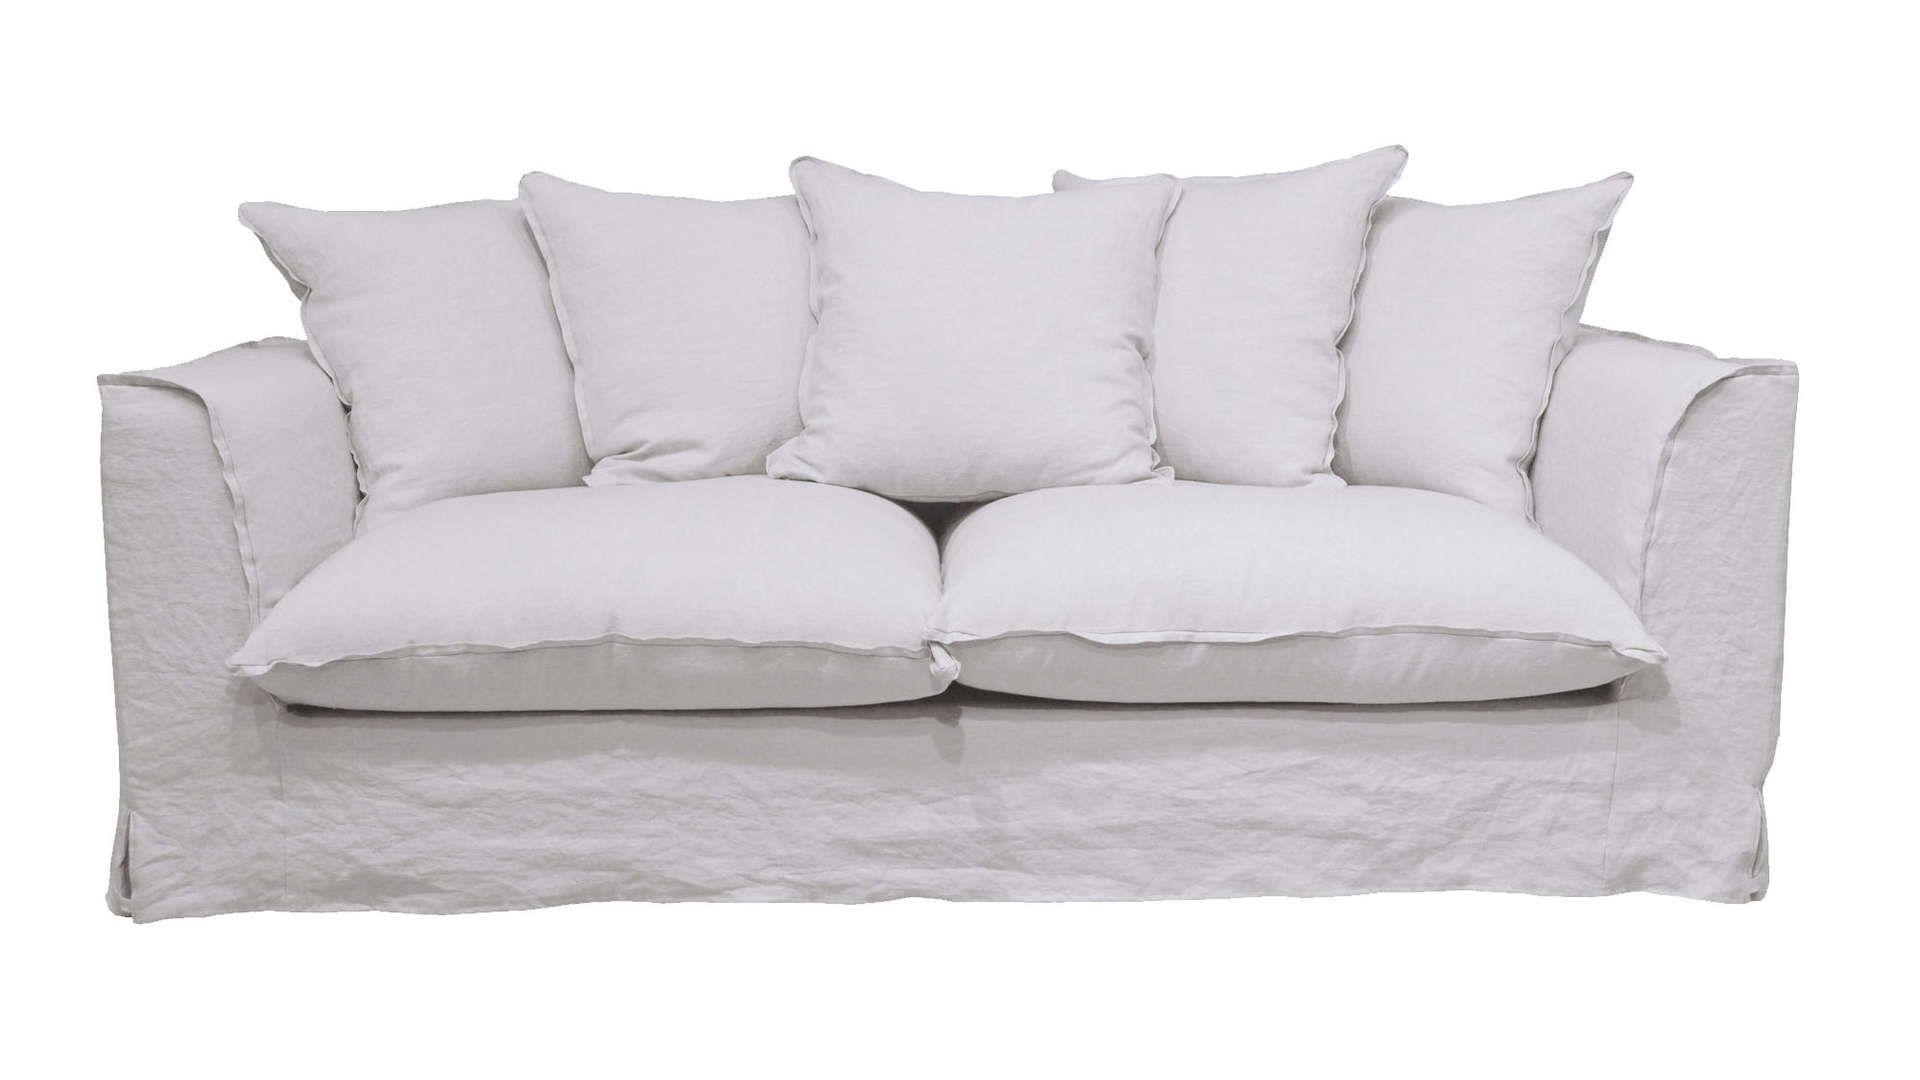 Canape Fixe 3 Places En Tissu Cocoon Coloris Blanc Canape Fixe Canape Fixe 3 Places Canape Droit